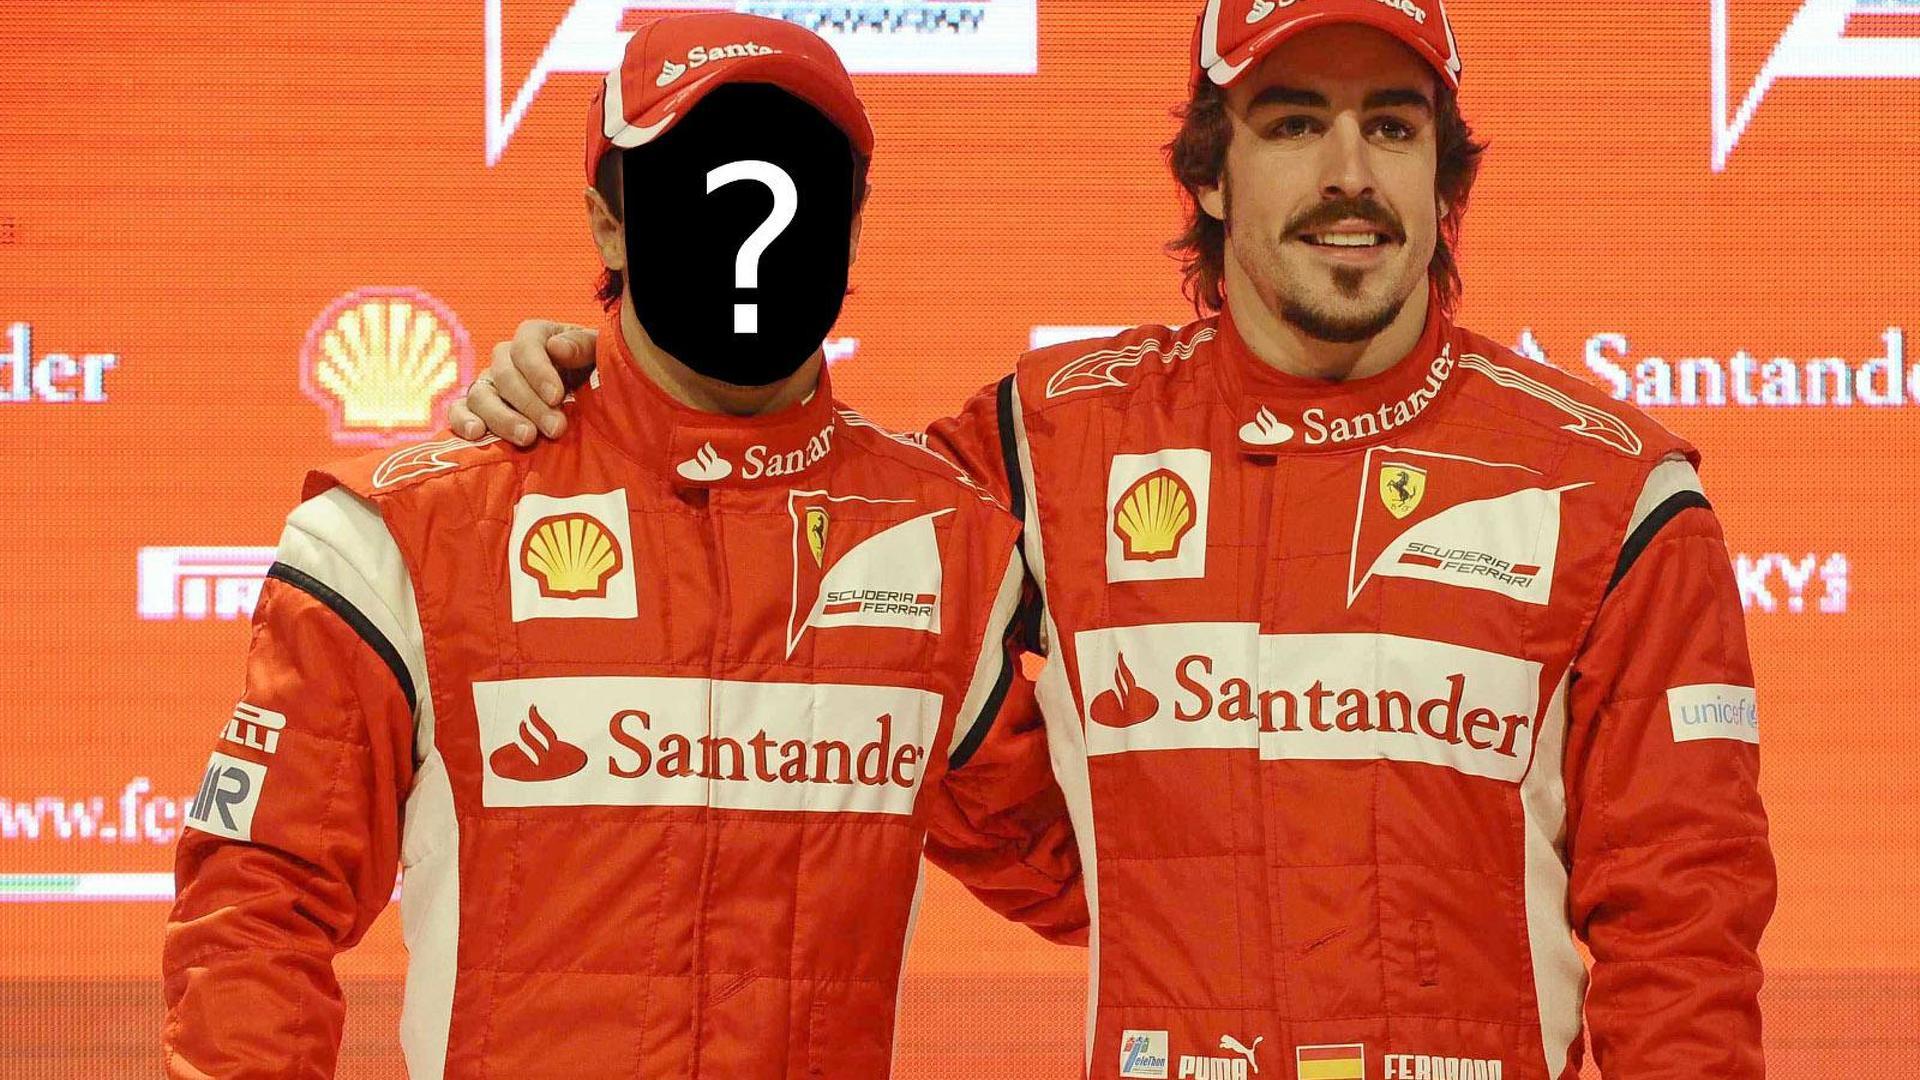 No driver announcement at Monza - Ferrari